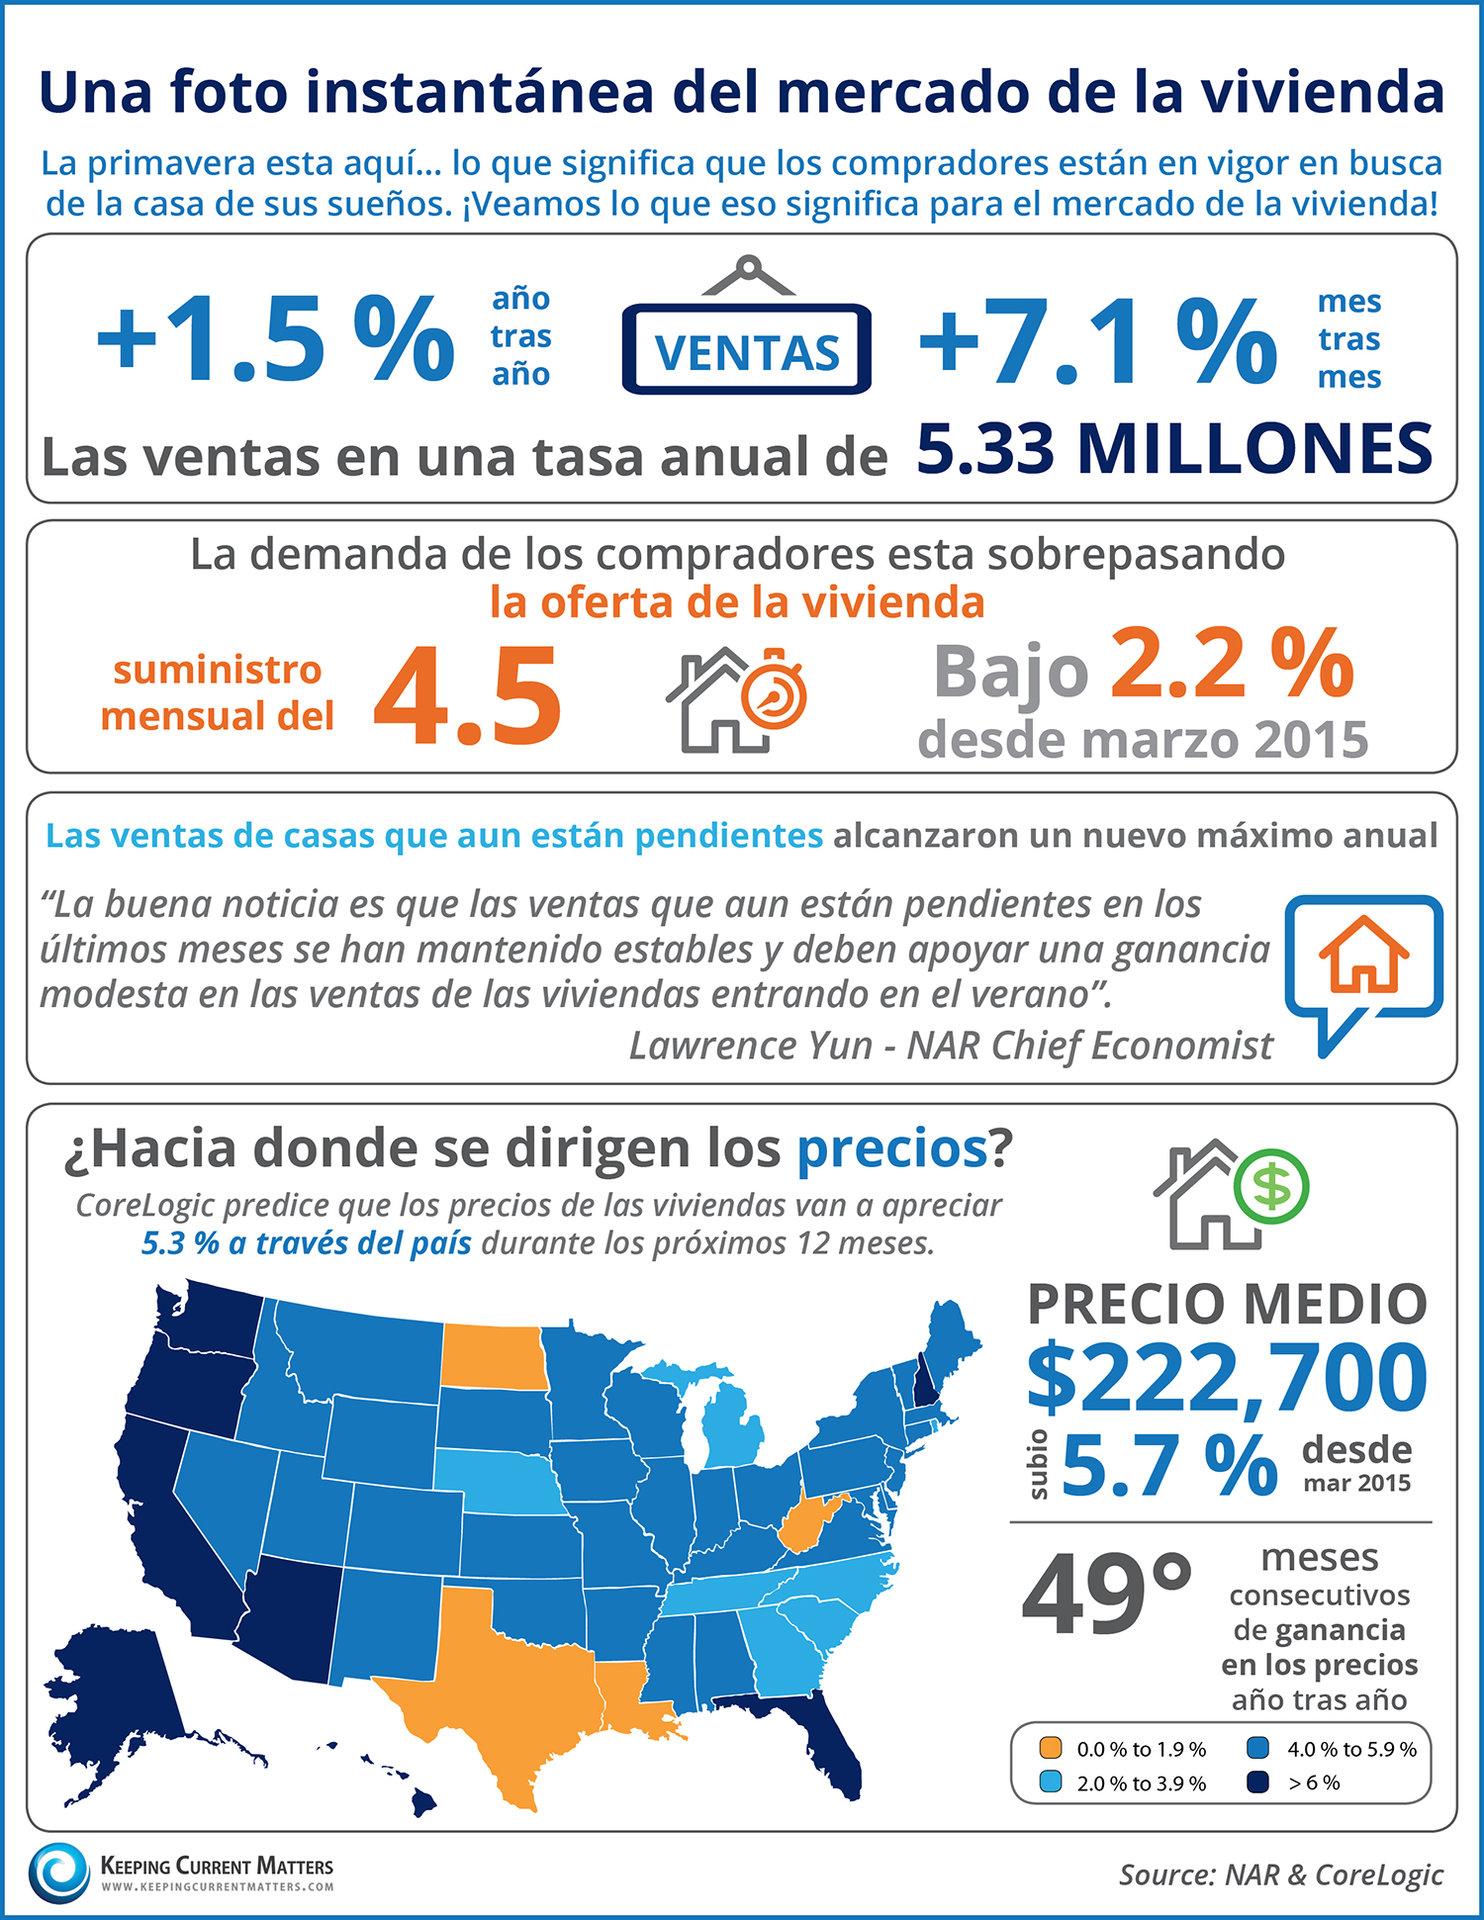 Una foto instantánea del mercado de la vivienda [infografía]| Keeping Current Matters